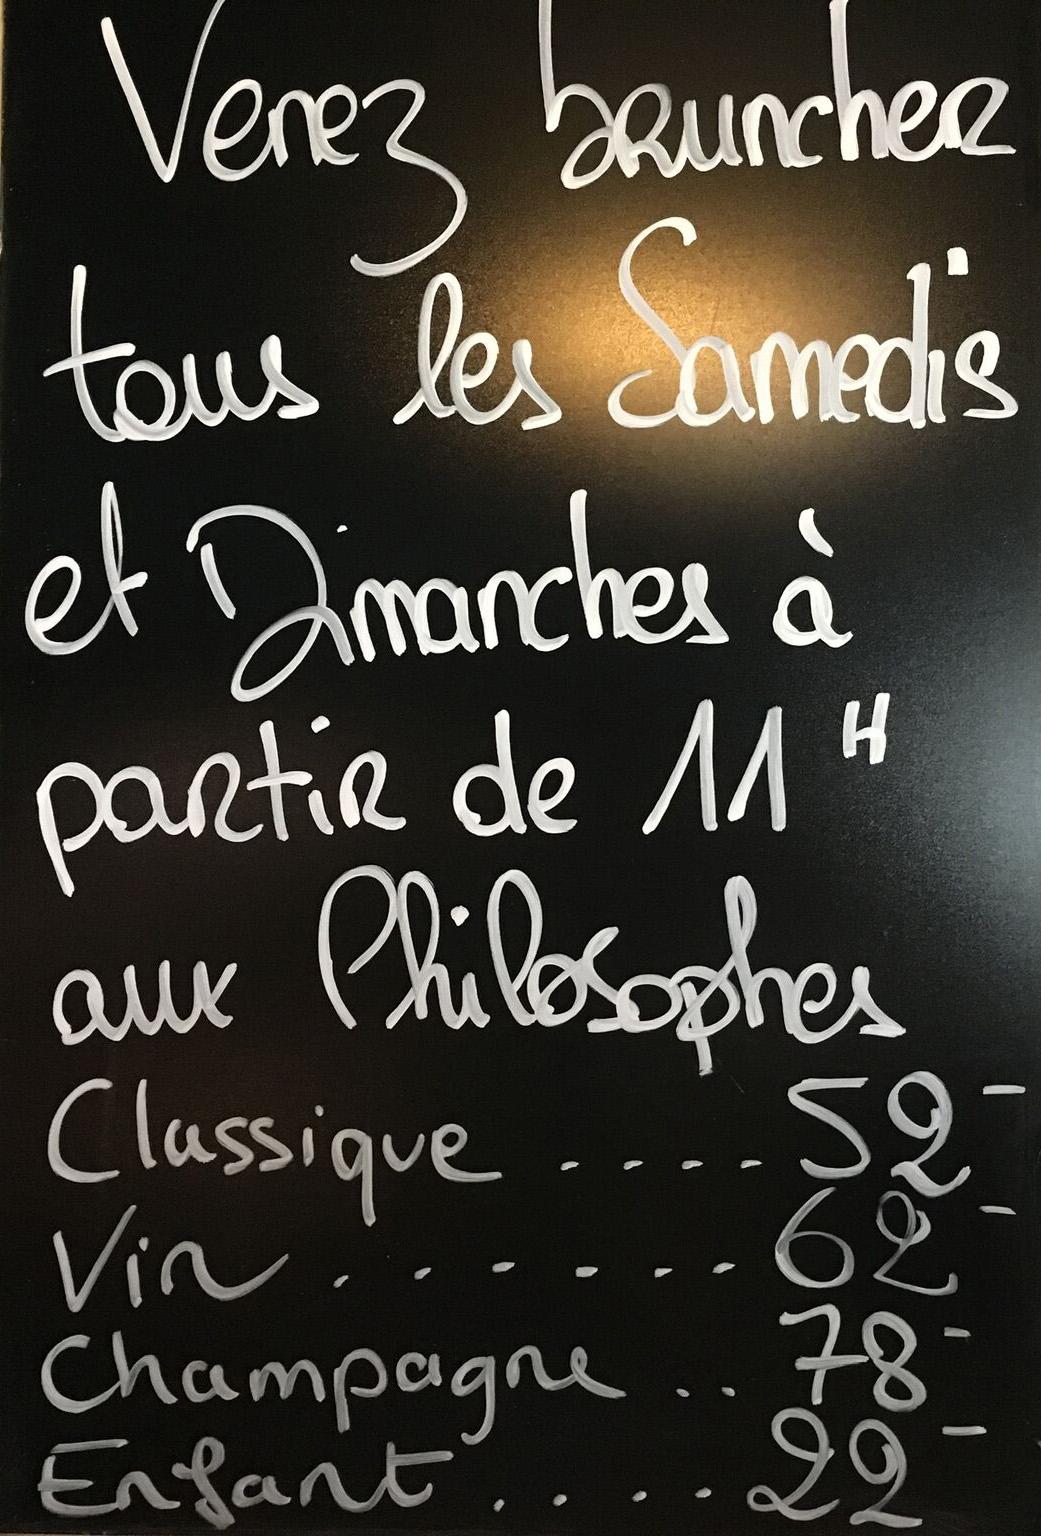 brunch des philosophe Genève bythelake